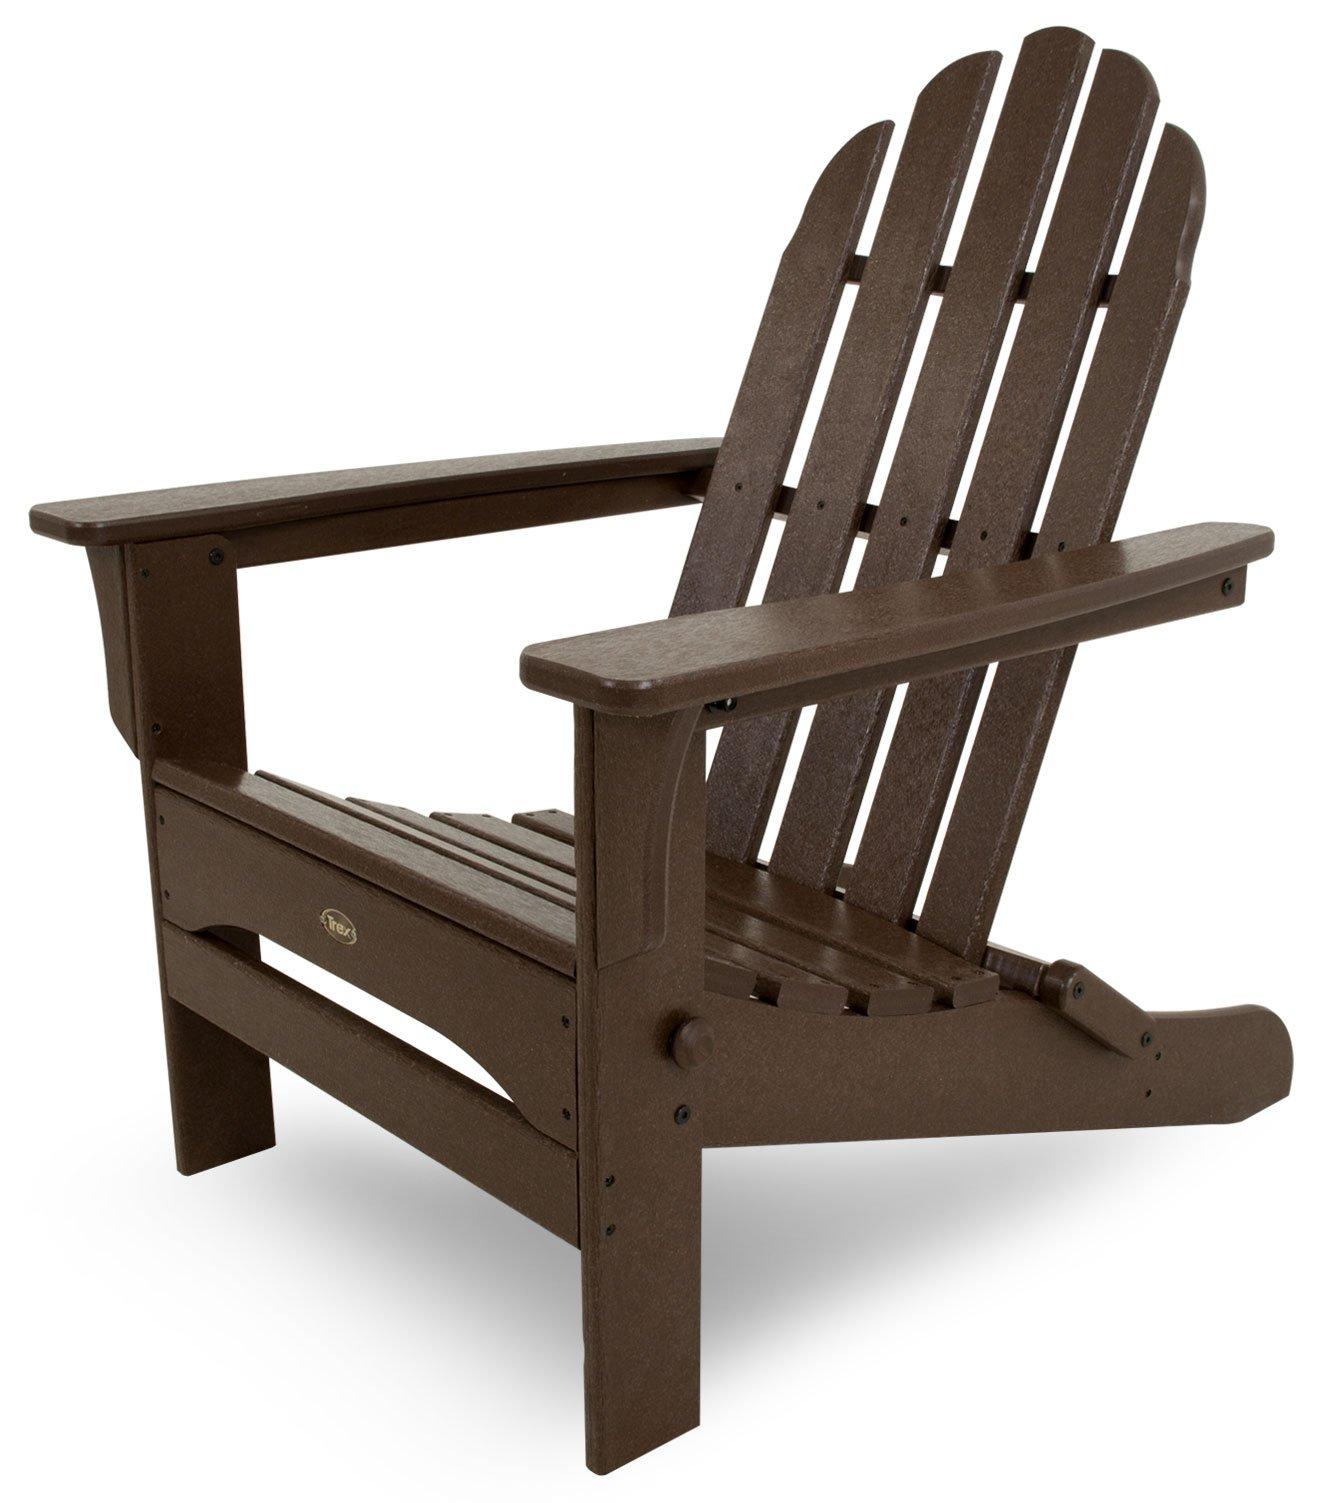 Trex Outdoor Furniture Cape Cod Folding Adirondack Chair, Vintage Lantern